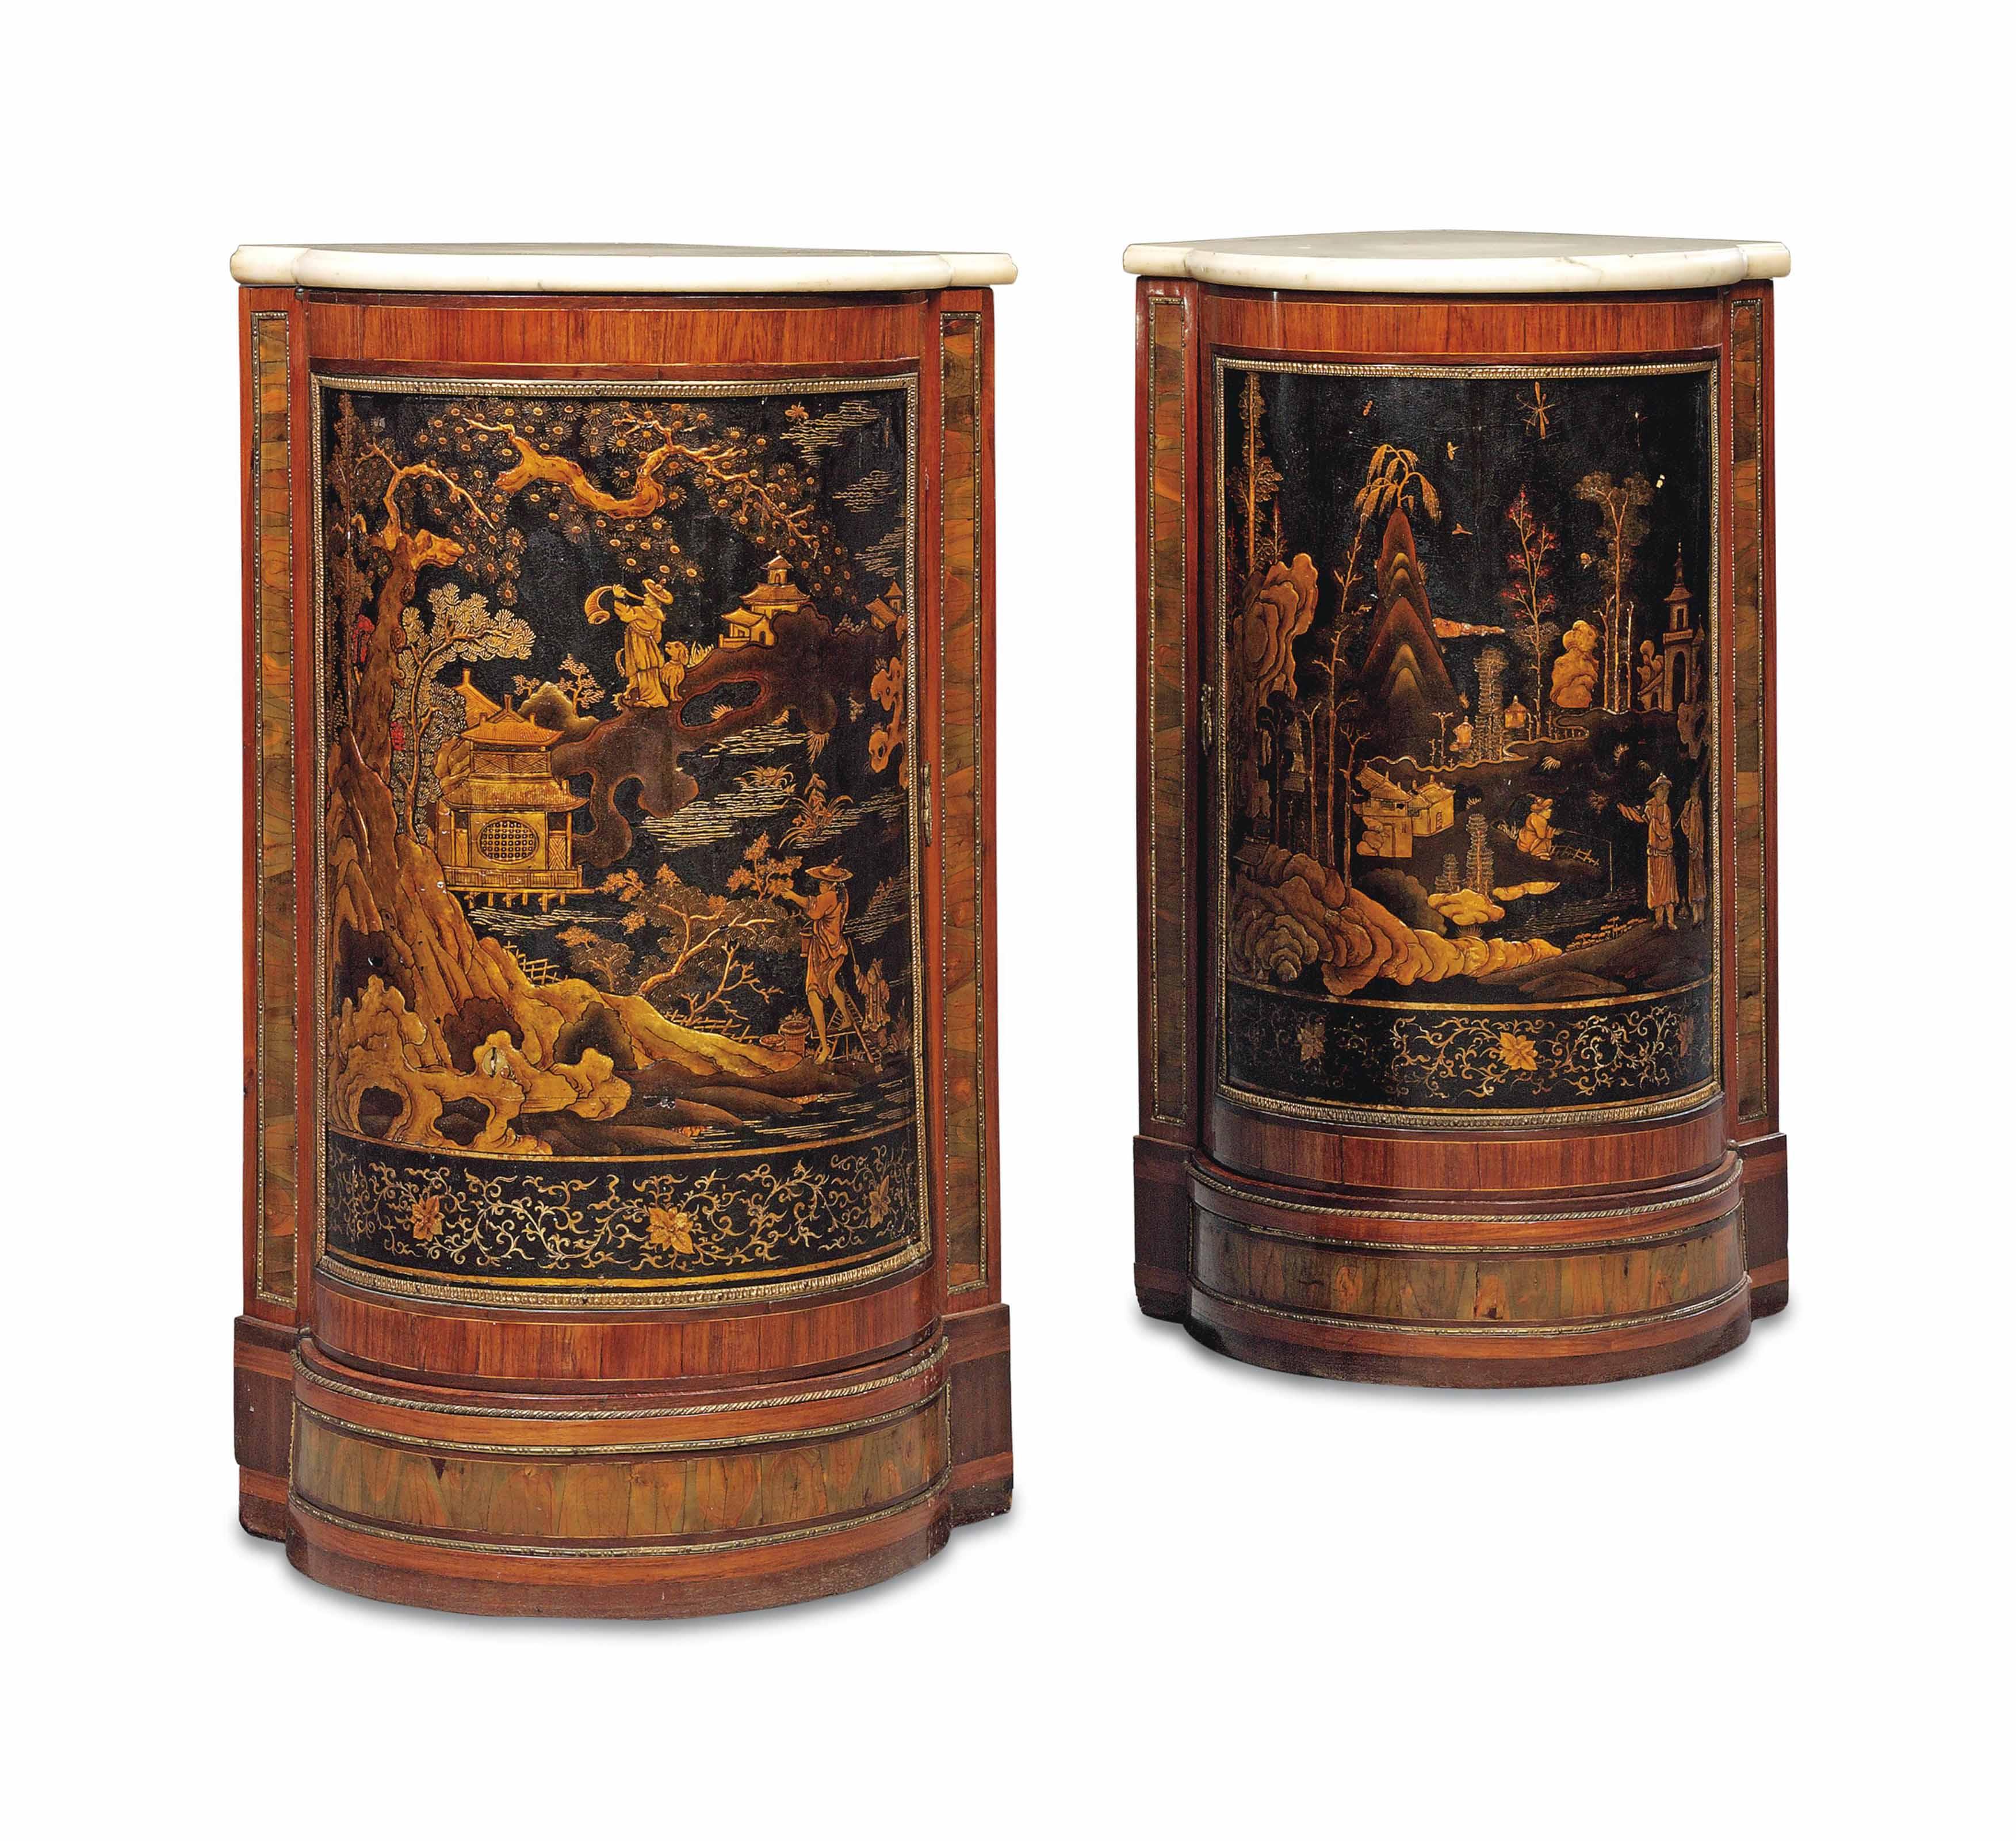 A PAIR OF LOUIS XVI ORMOLU-MOUNTED TULIPWOOD, SATINE, AMARANTH, OLIVEWOOD AND BLACK AND GILT VERNIS MARTIN ENCOIGNURES